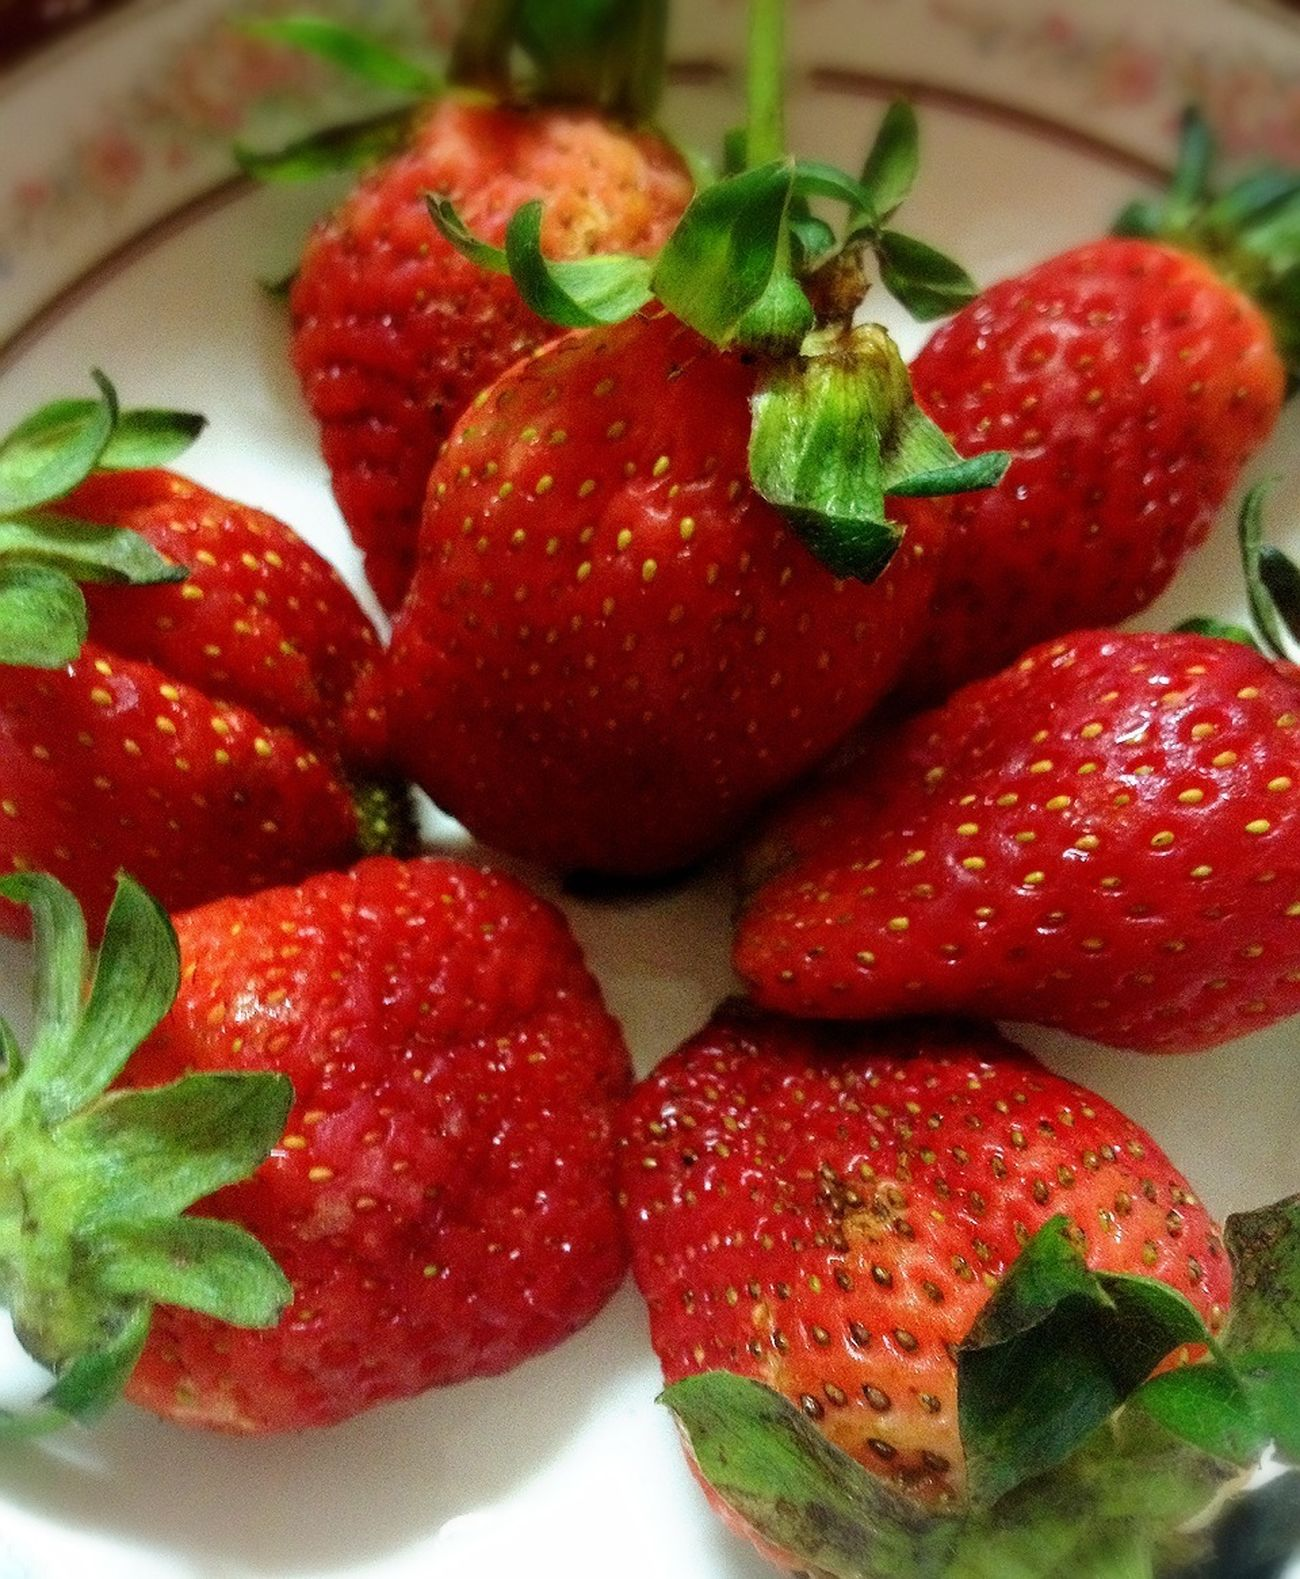 Big Strawberry? Enjoying Life